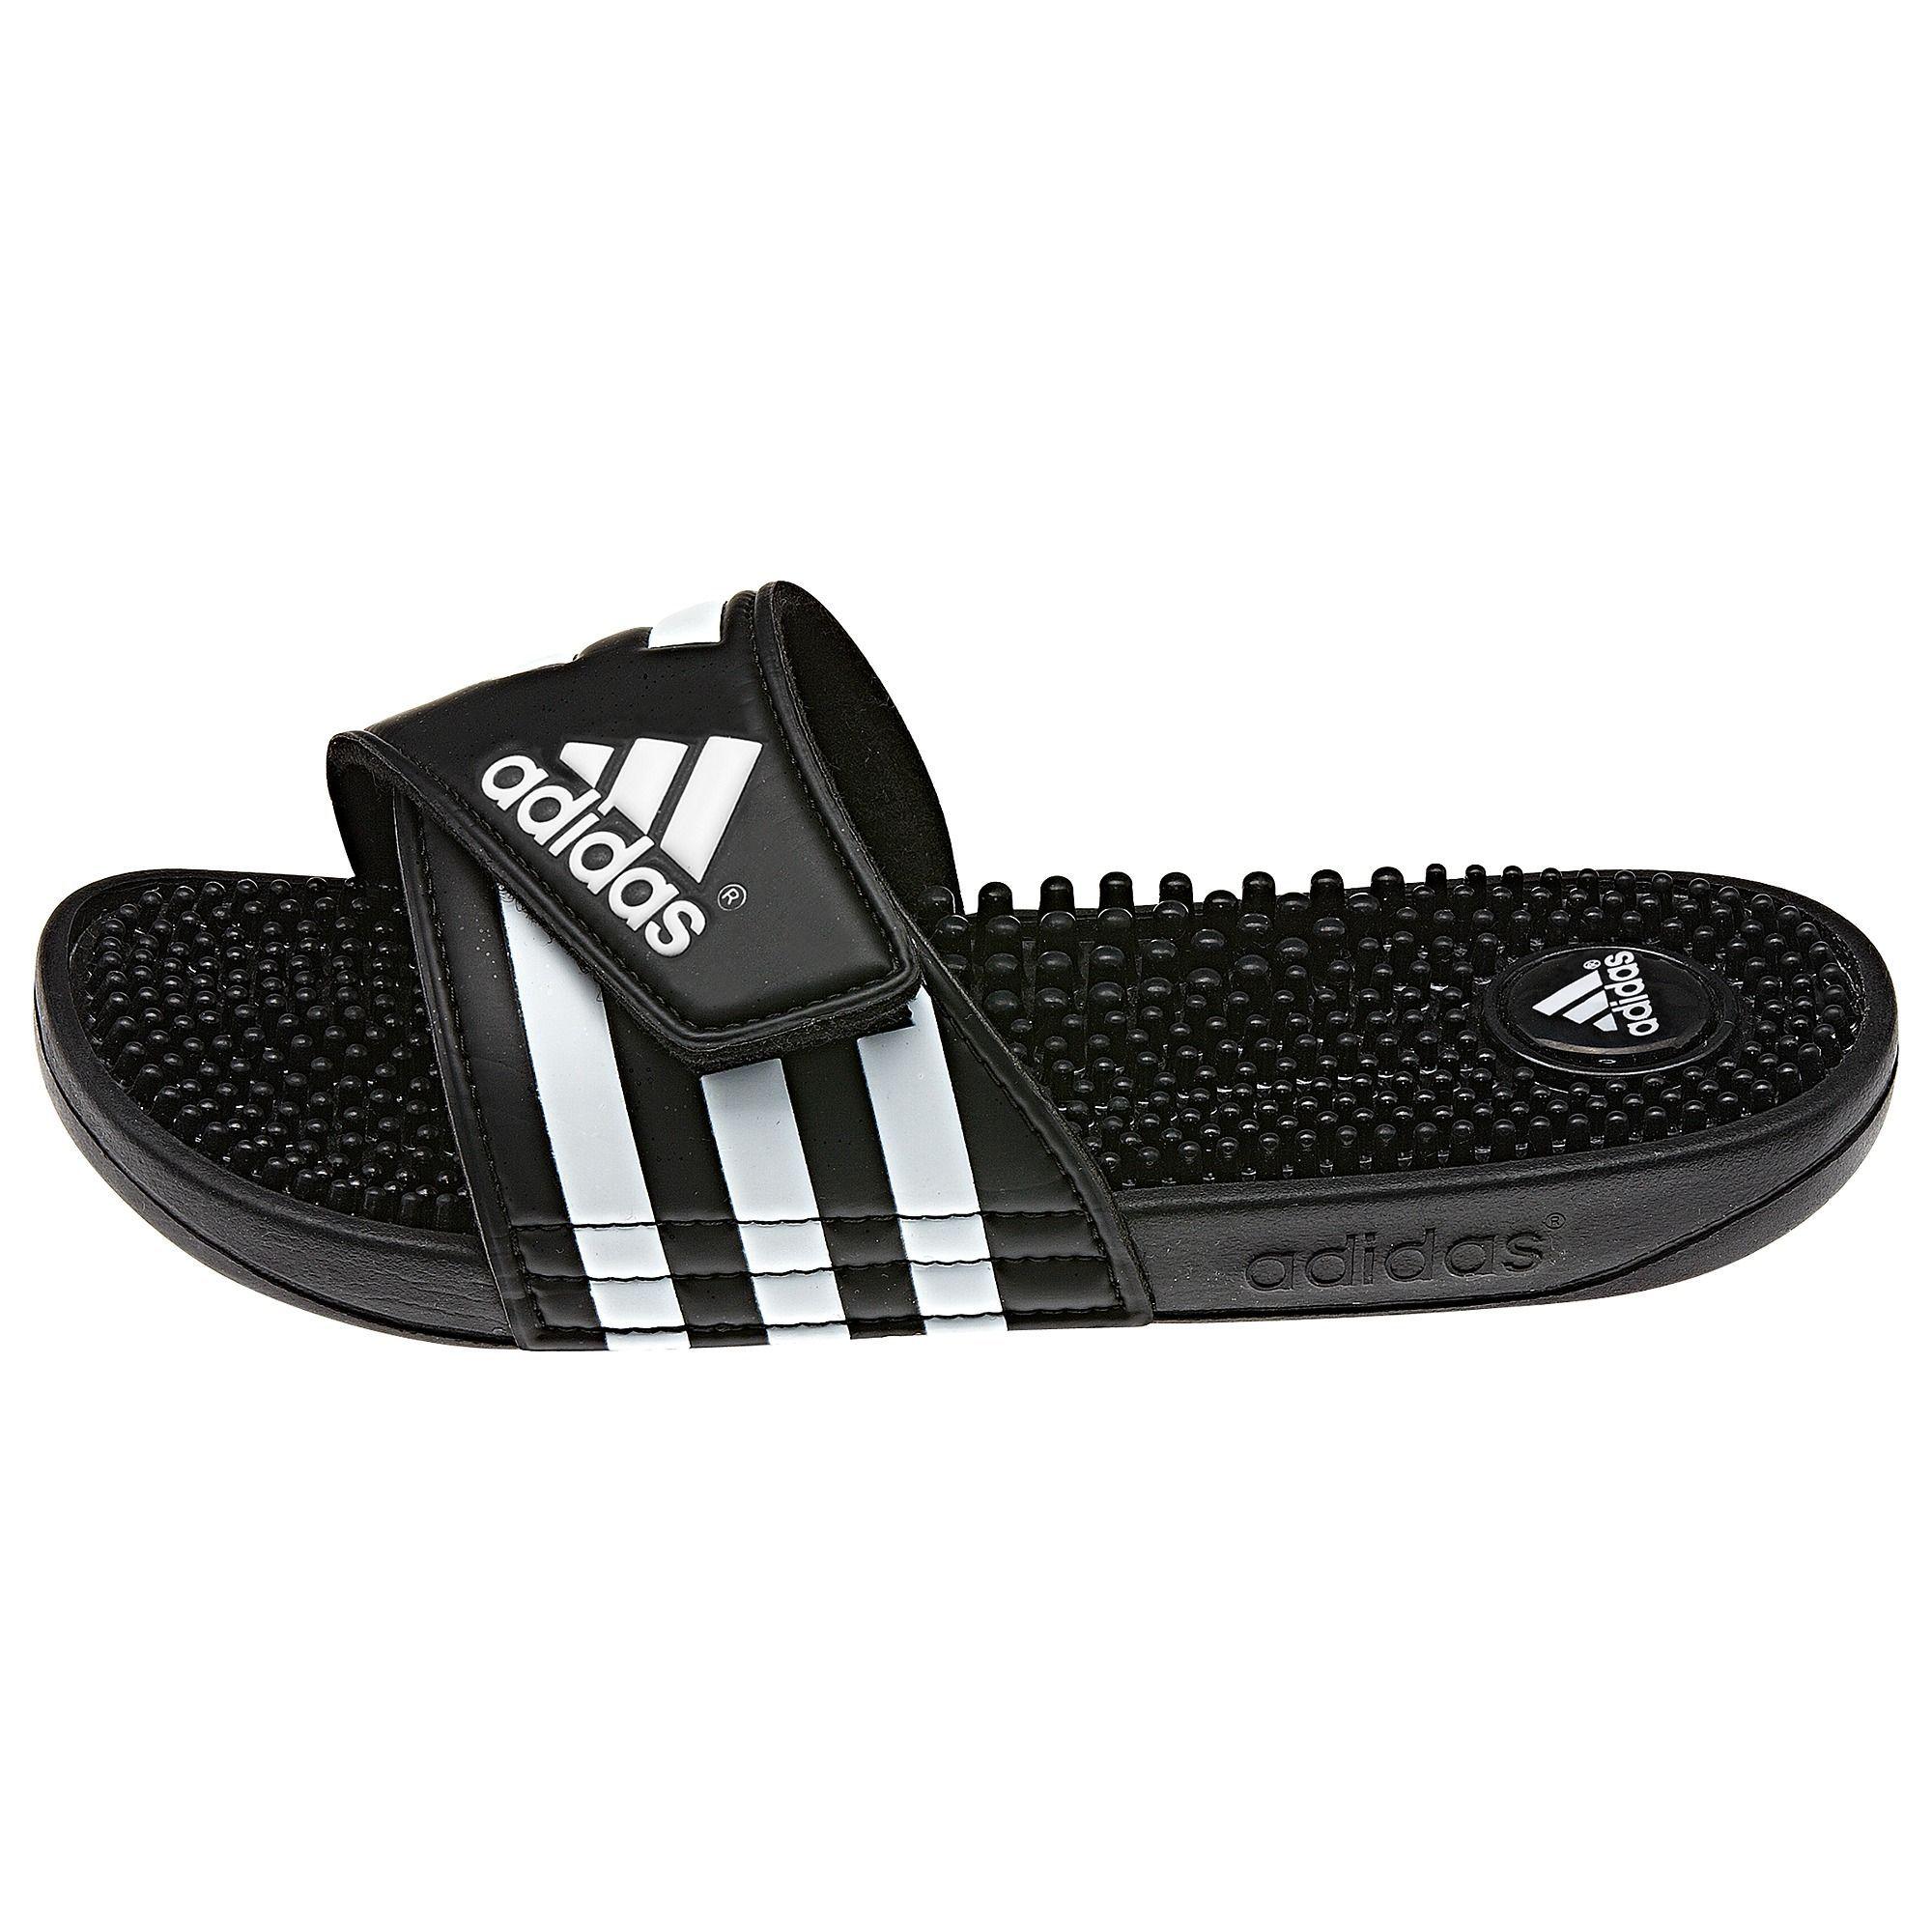 new arrival 55891 9600c adidas - adissage Slides